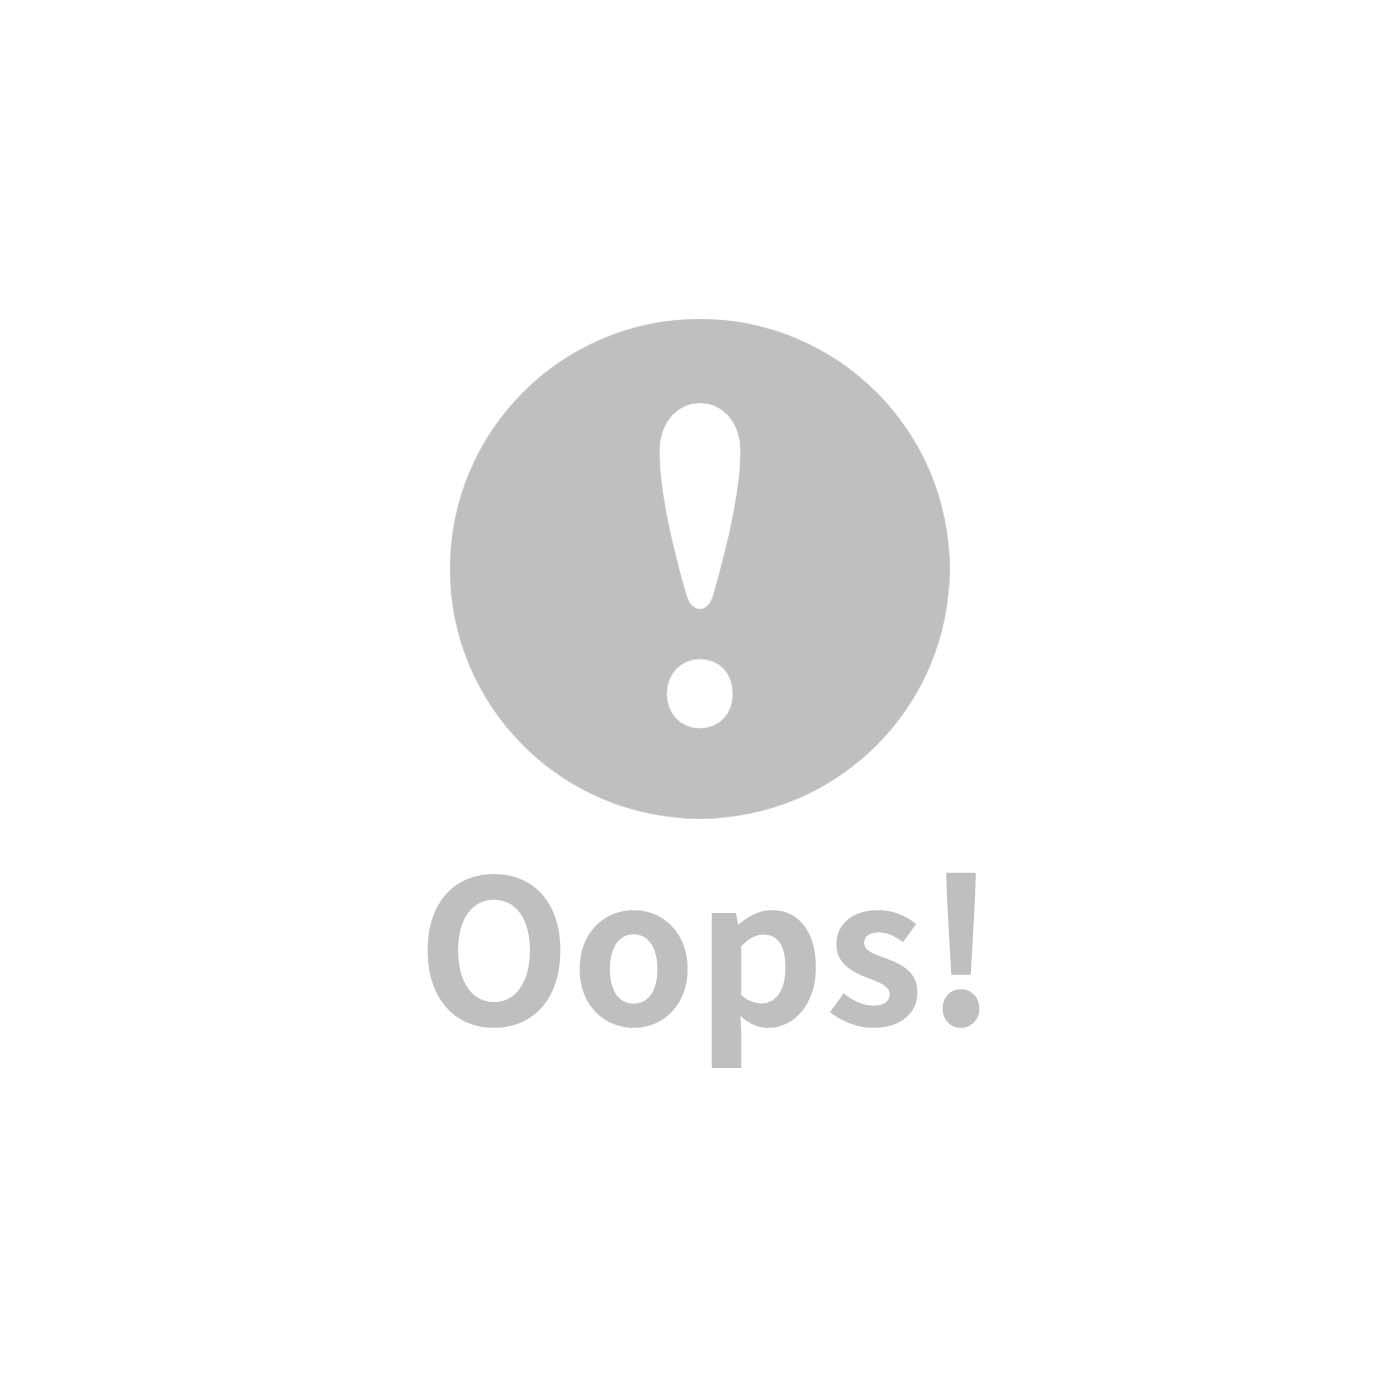 Soopsori全腦開發‧原粹木積木(烹飪派對)